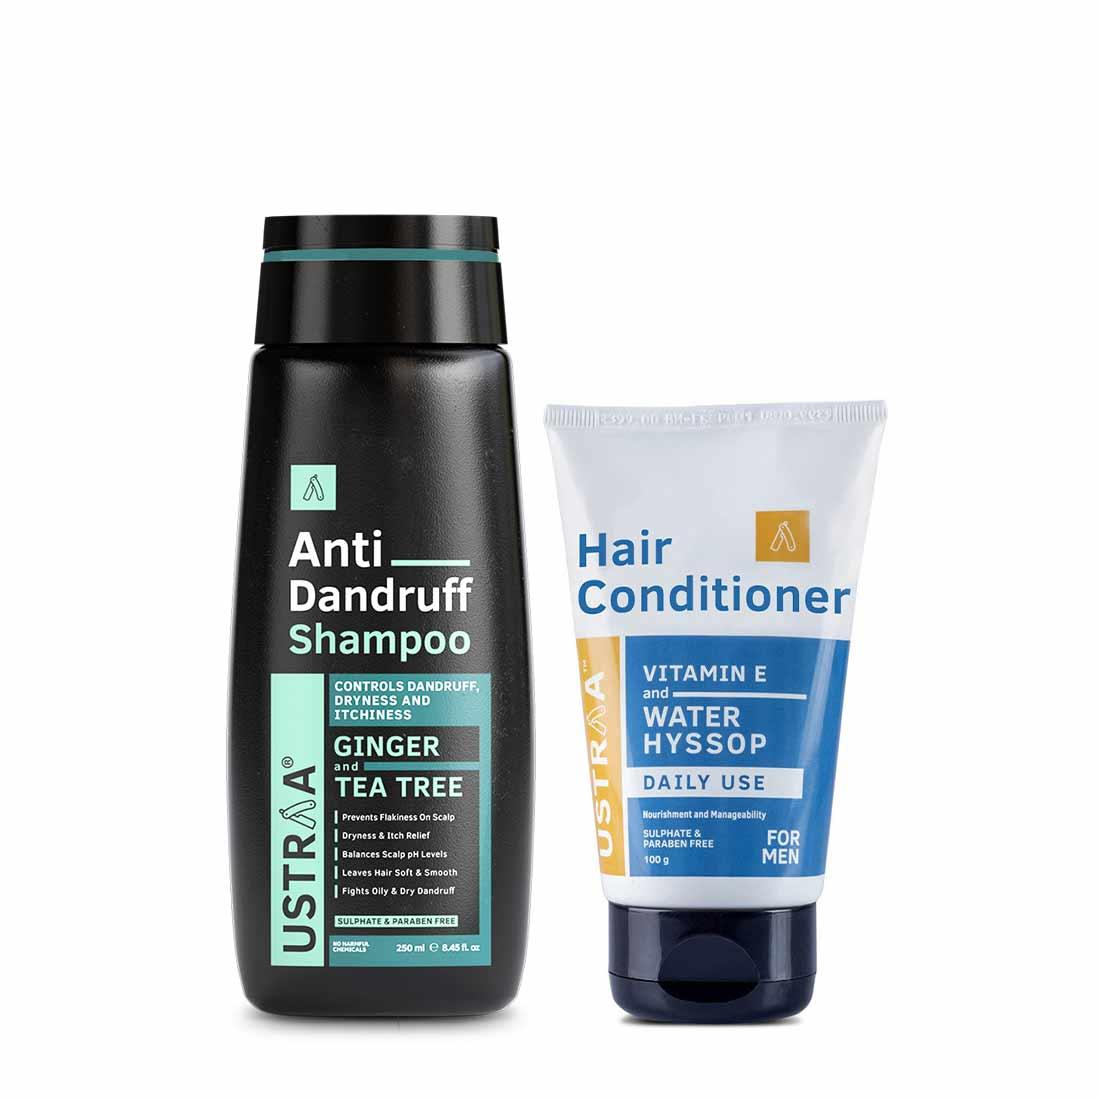 Anti-Dandruff Shampoo & Daily Use Hair Conditioner